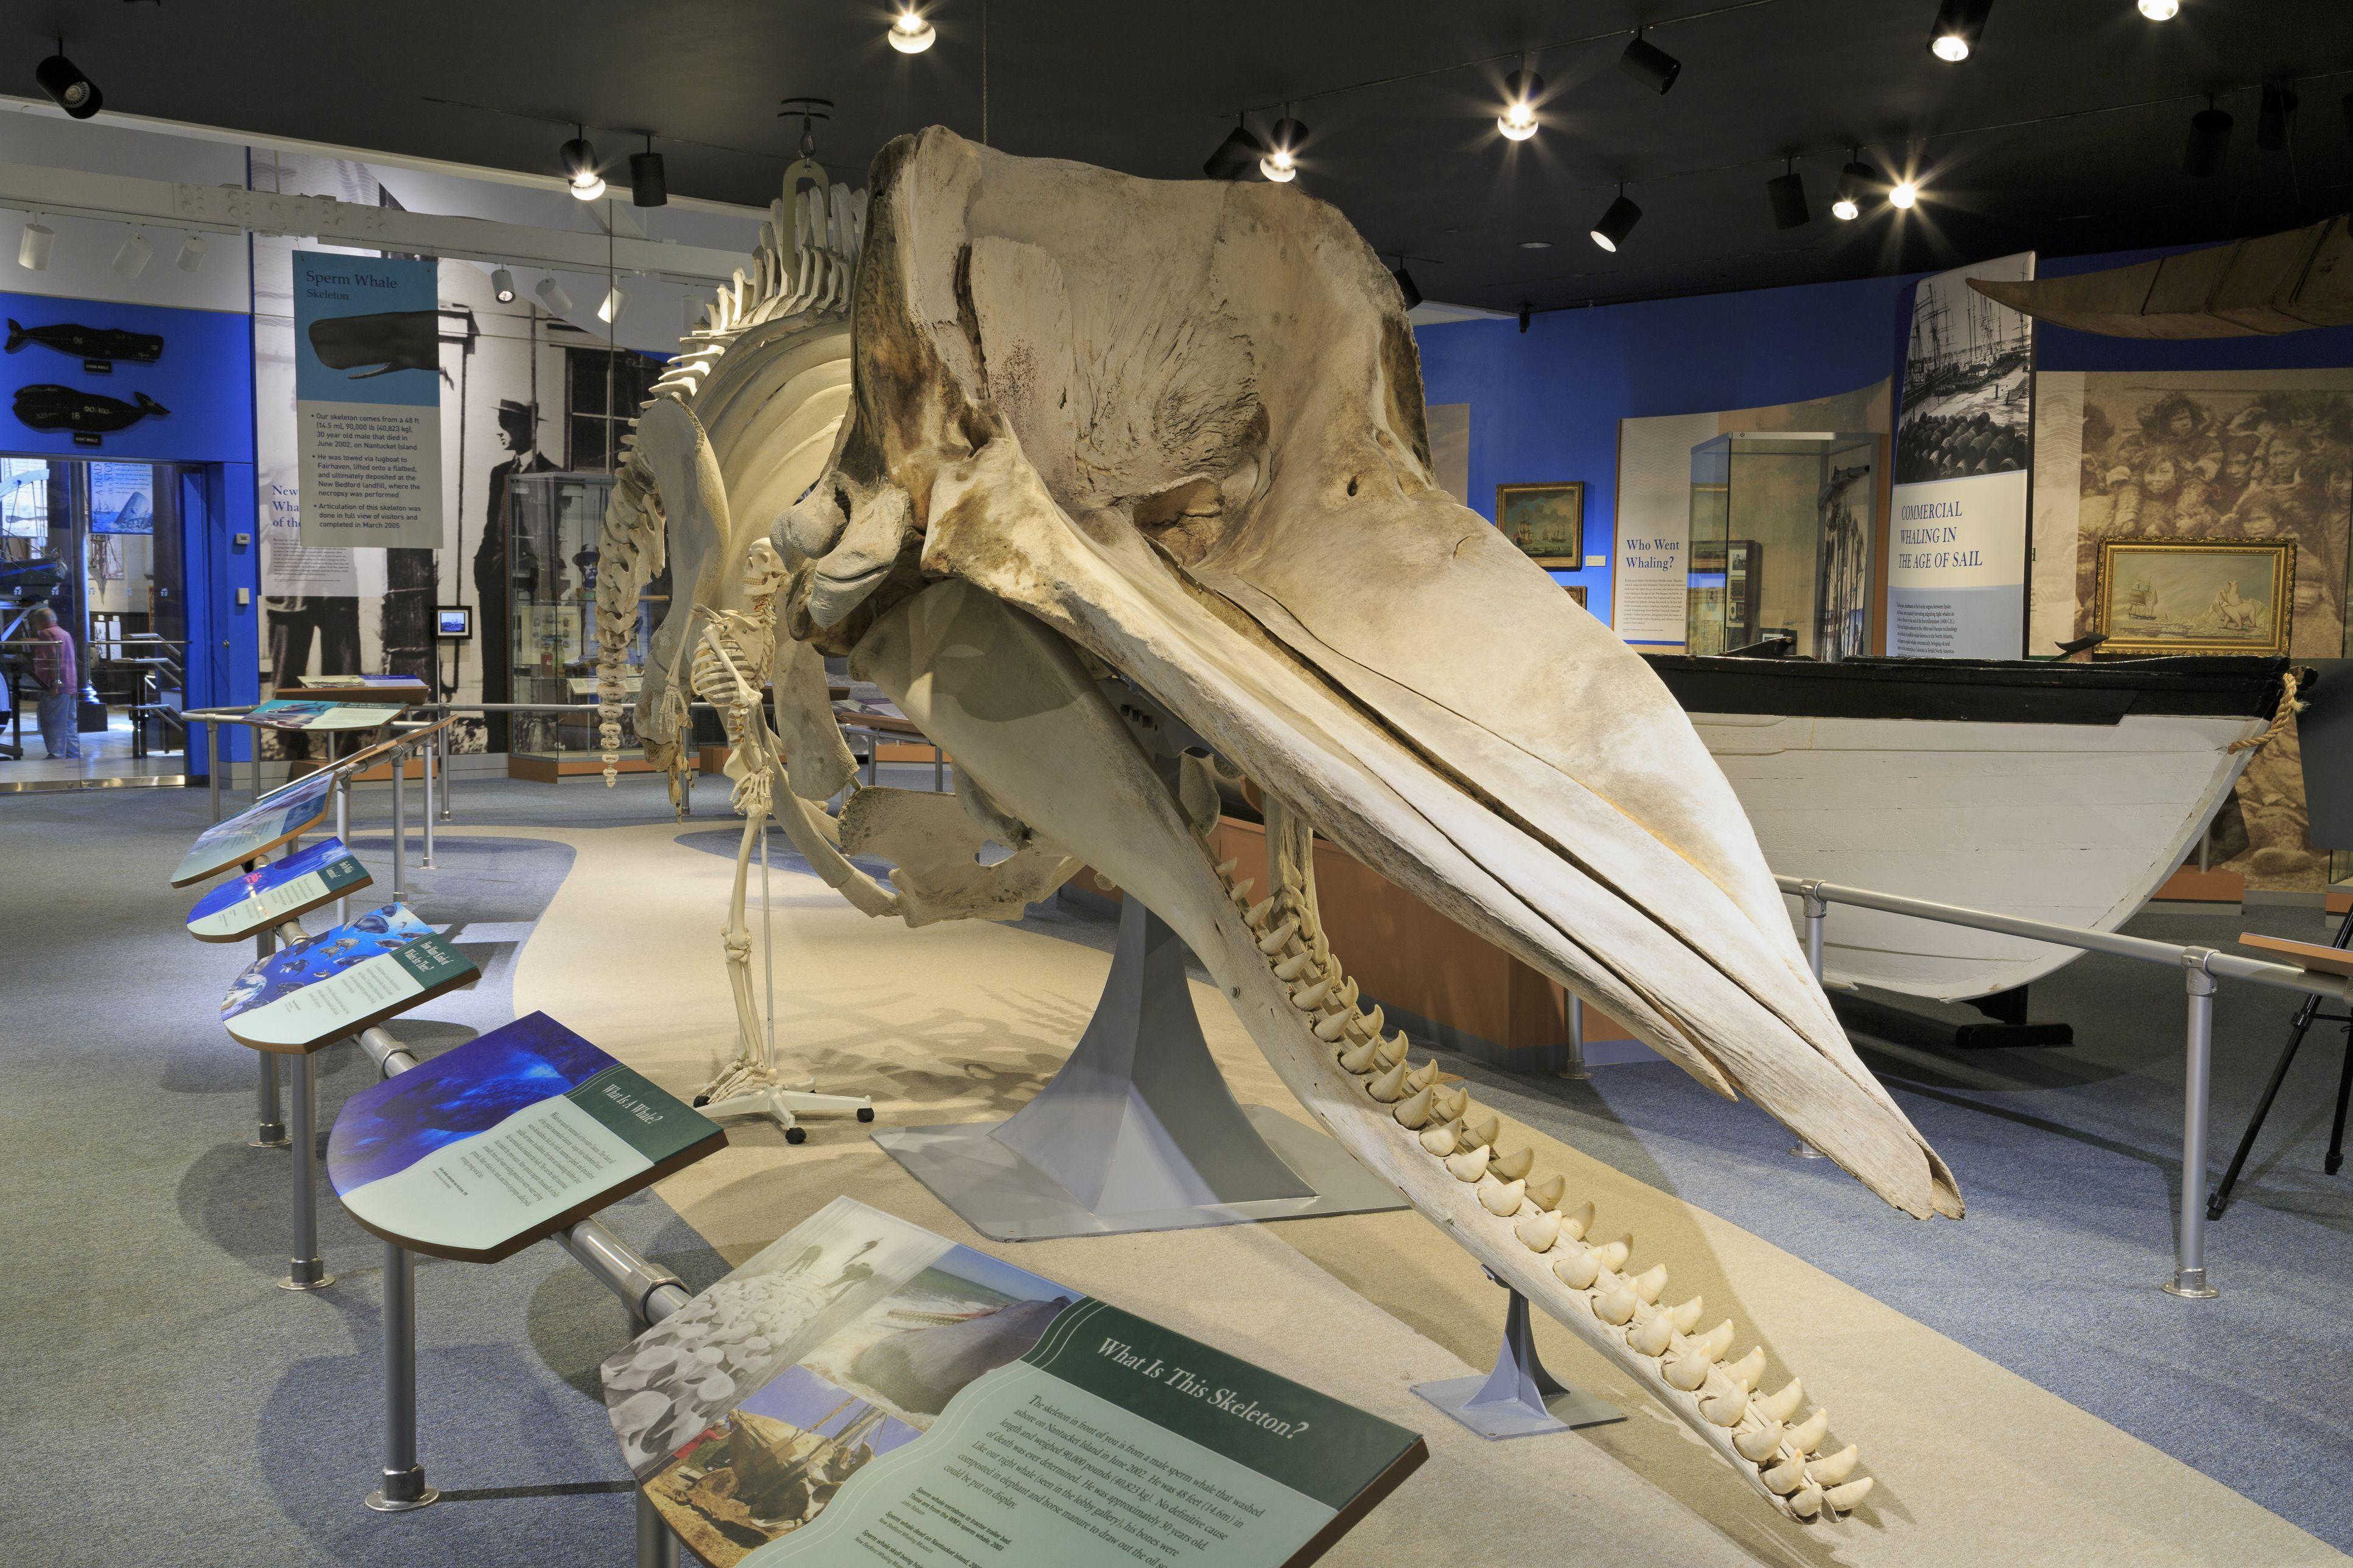 Whaling Museum National Historical Park, New Bedford, Massachusetts, USA